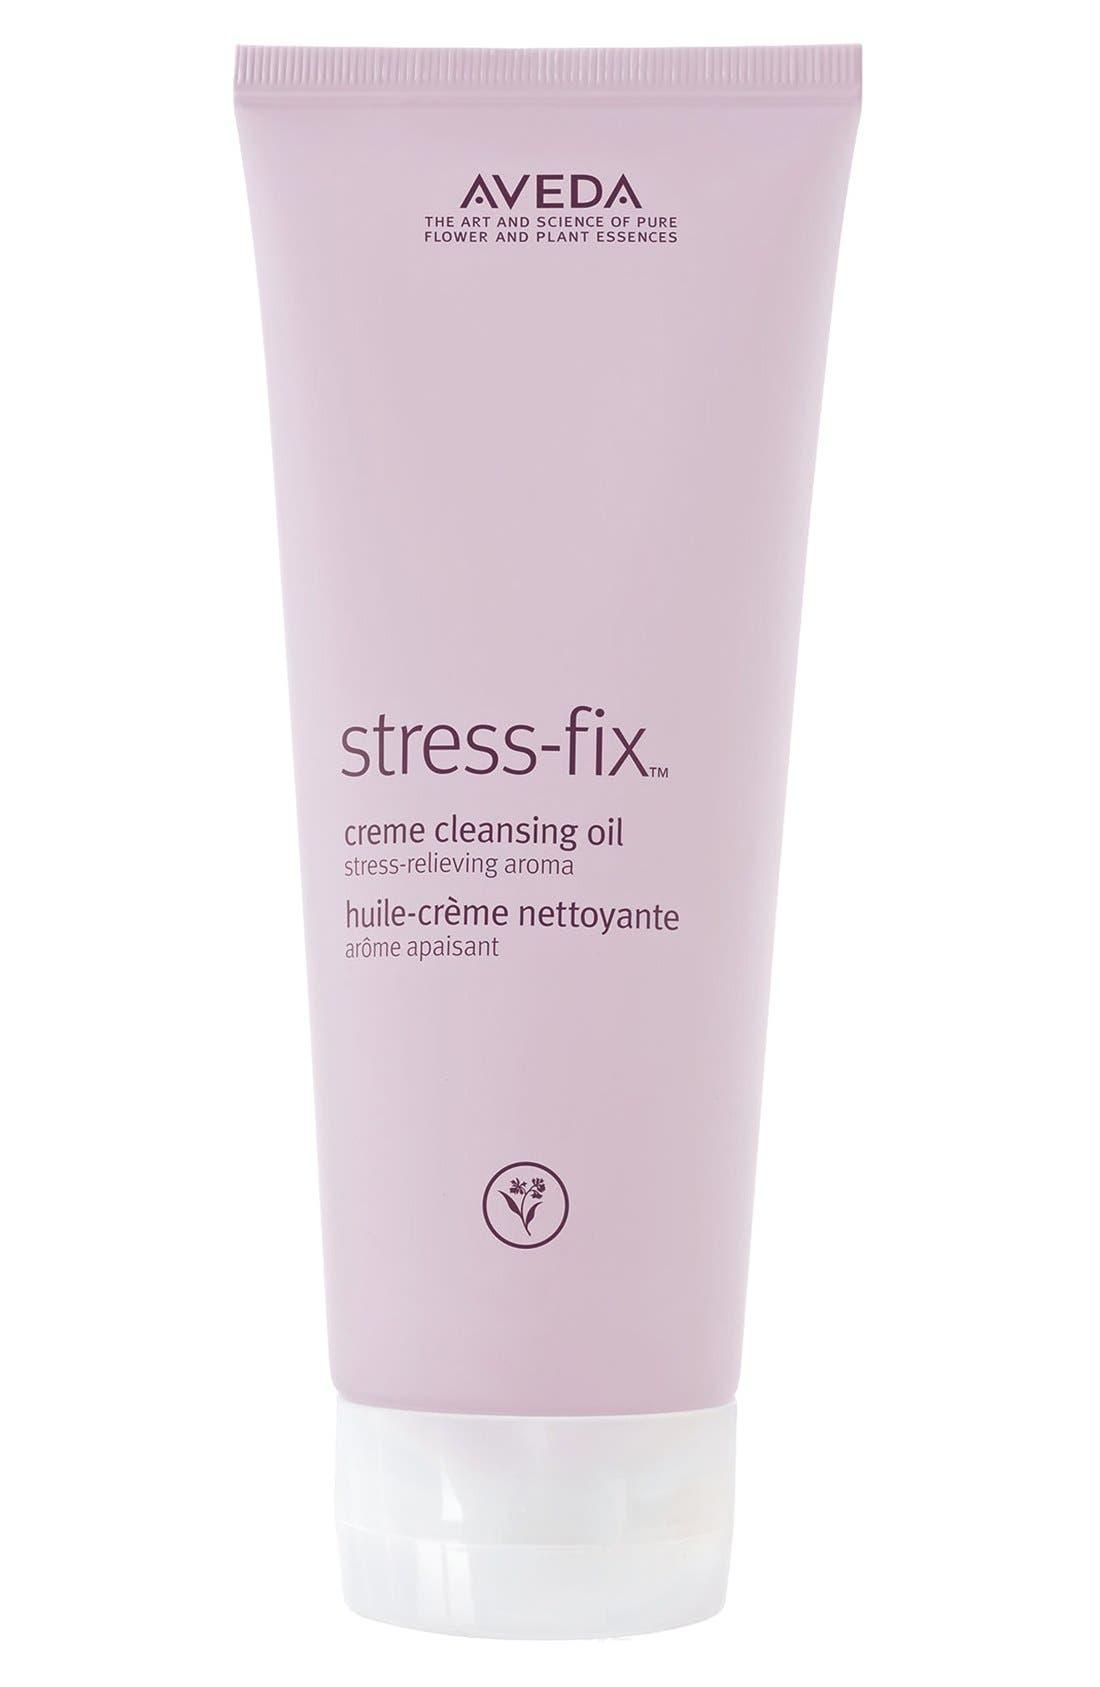 Aveda 'stress-fix™' Crème Cleansing Oil